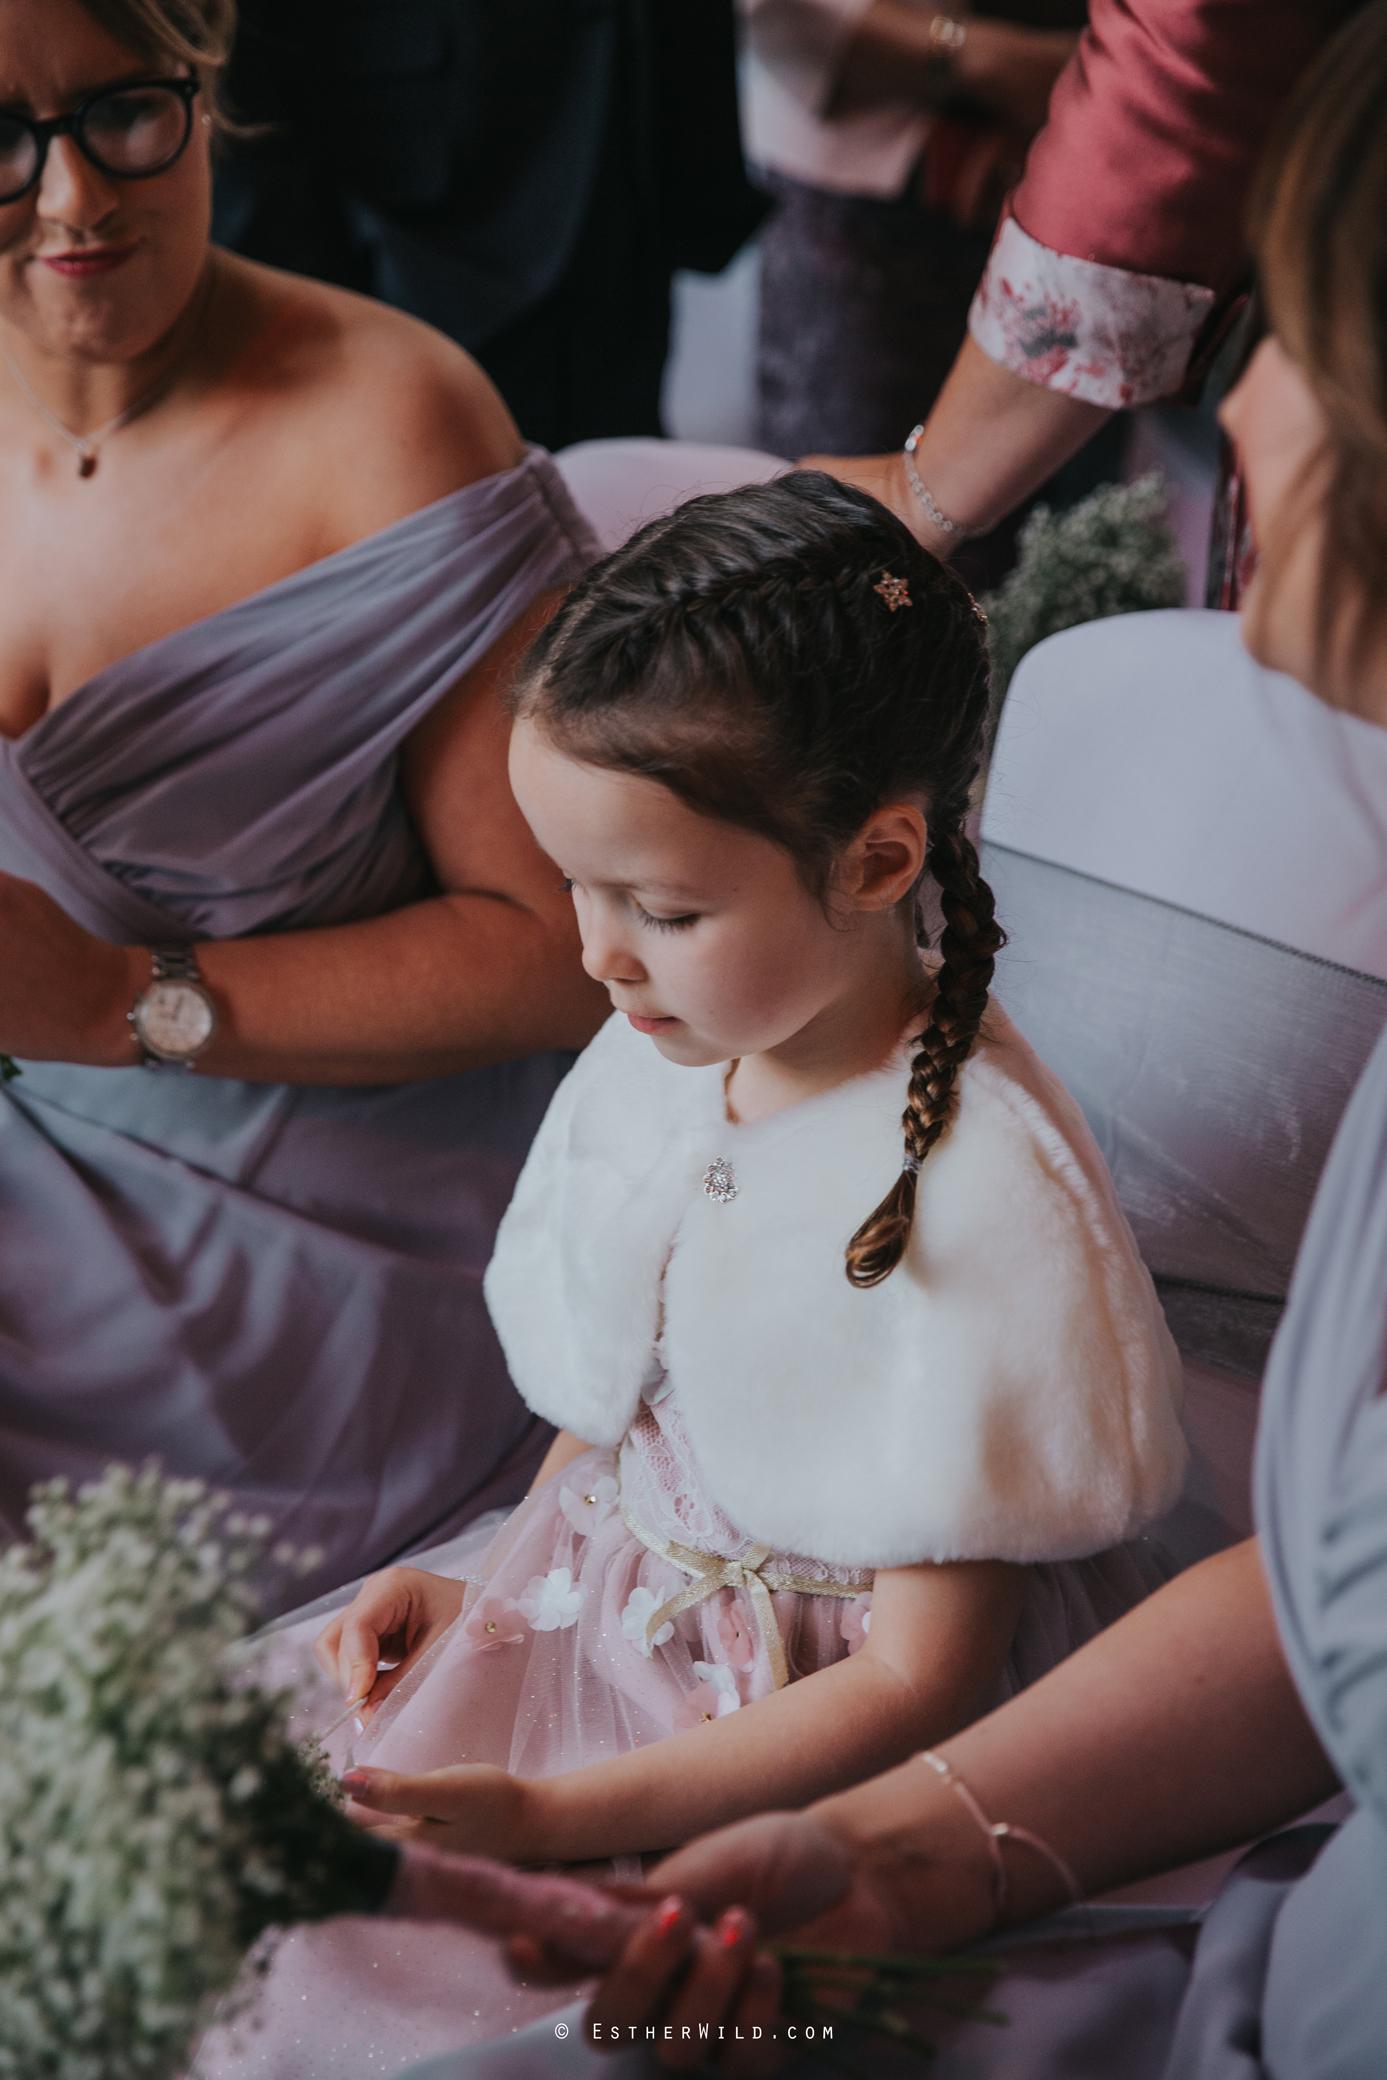 Wedding_Kings_Lynn_Town_Hall_Norfolk_Photographer_Esther_Wild_IMG_1167.jpg